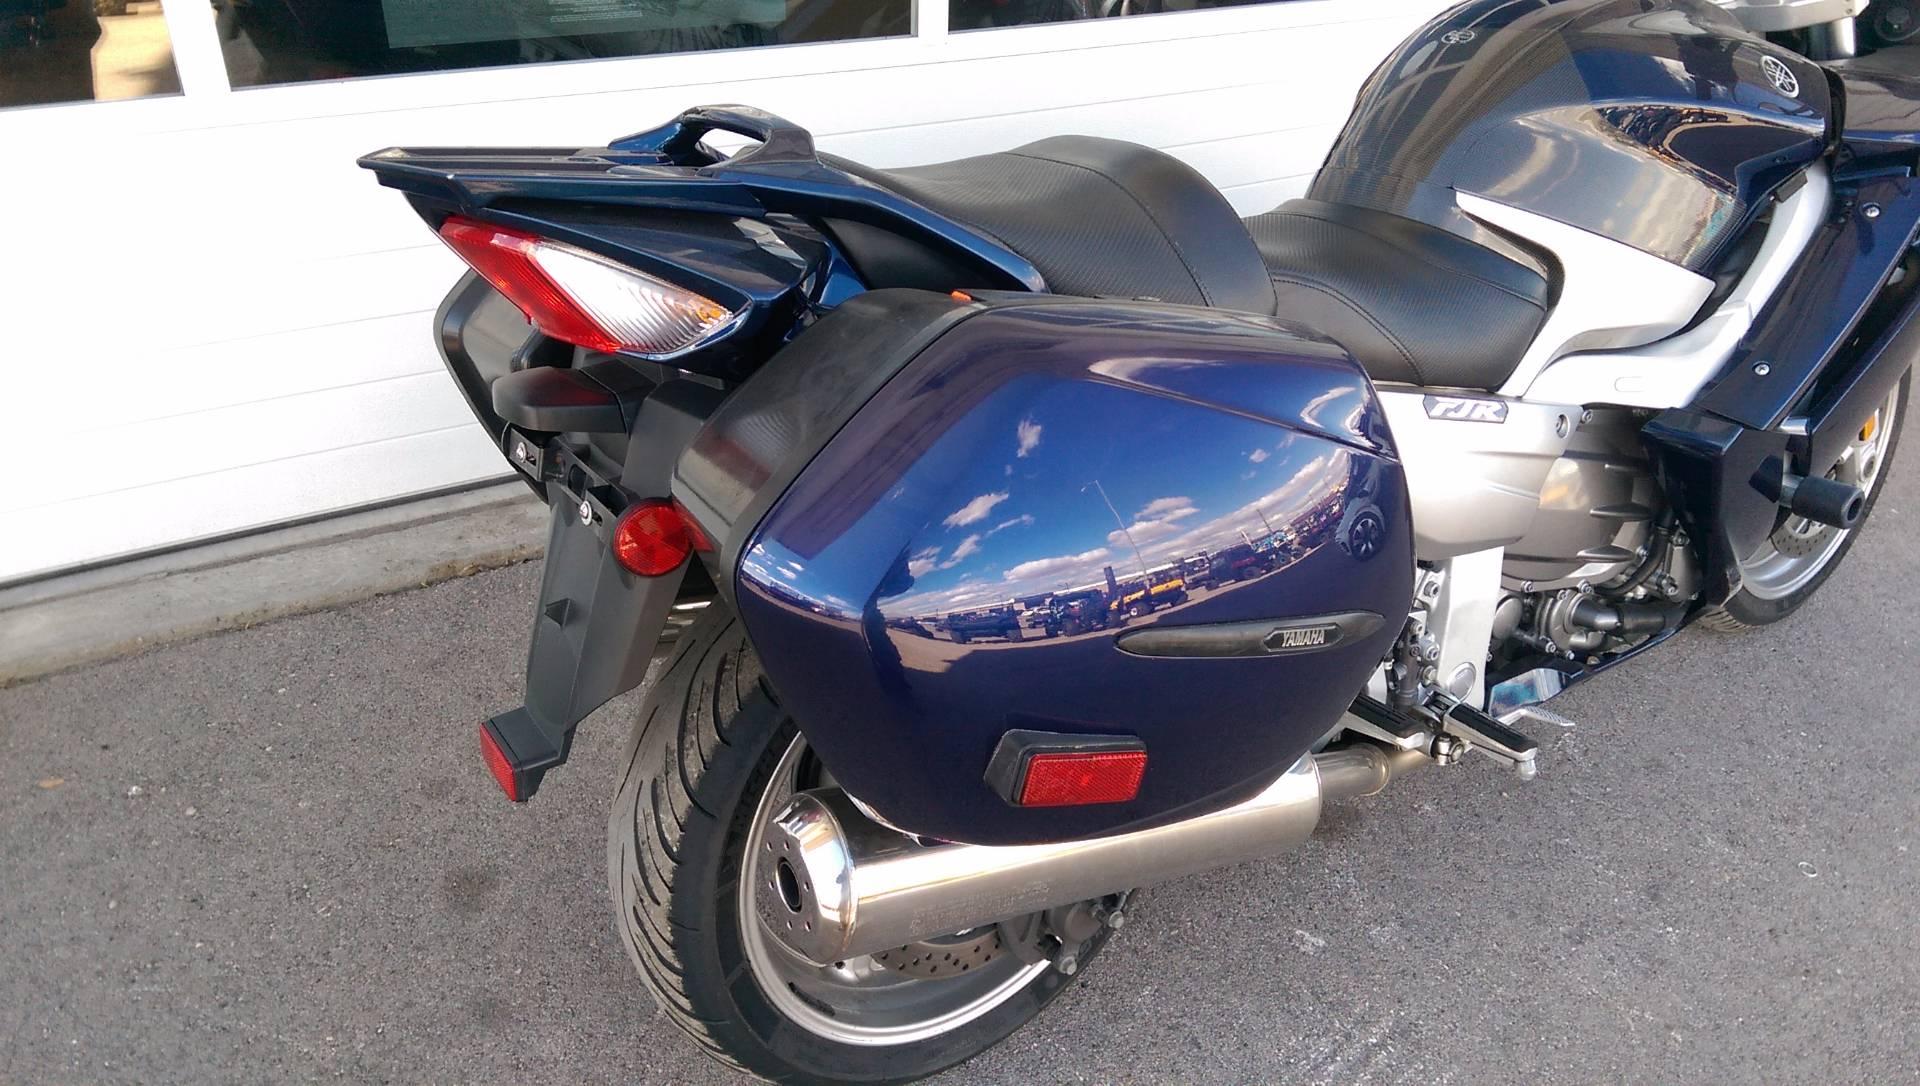 2006 Yamaha FJR 1300A 7